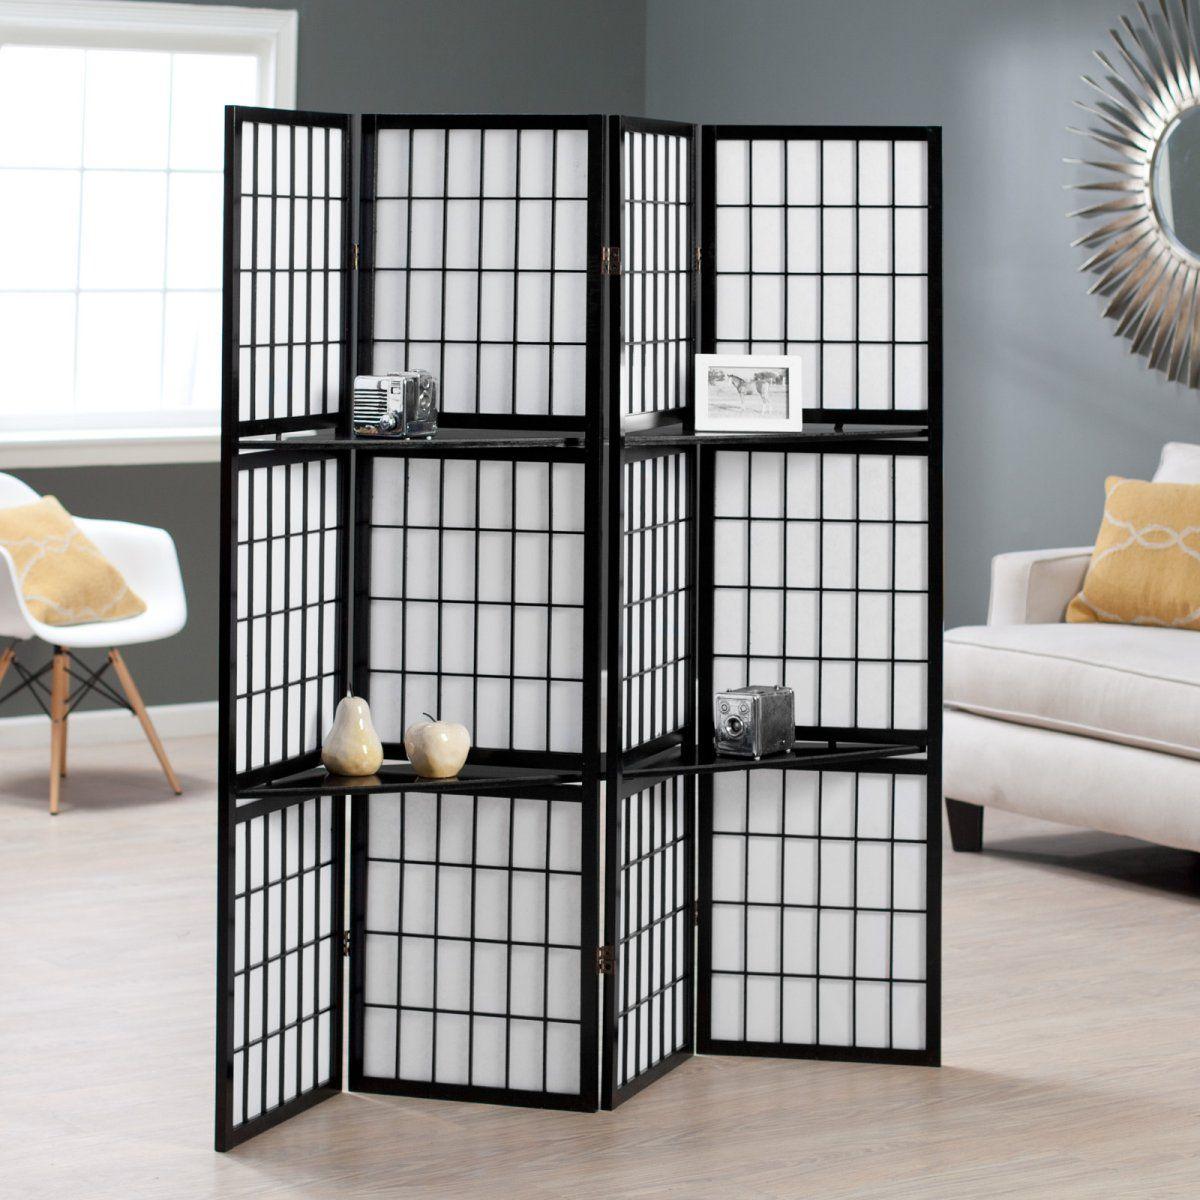 Black Shoji 4 Panel Screen Room Divider with Display Shelves 149